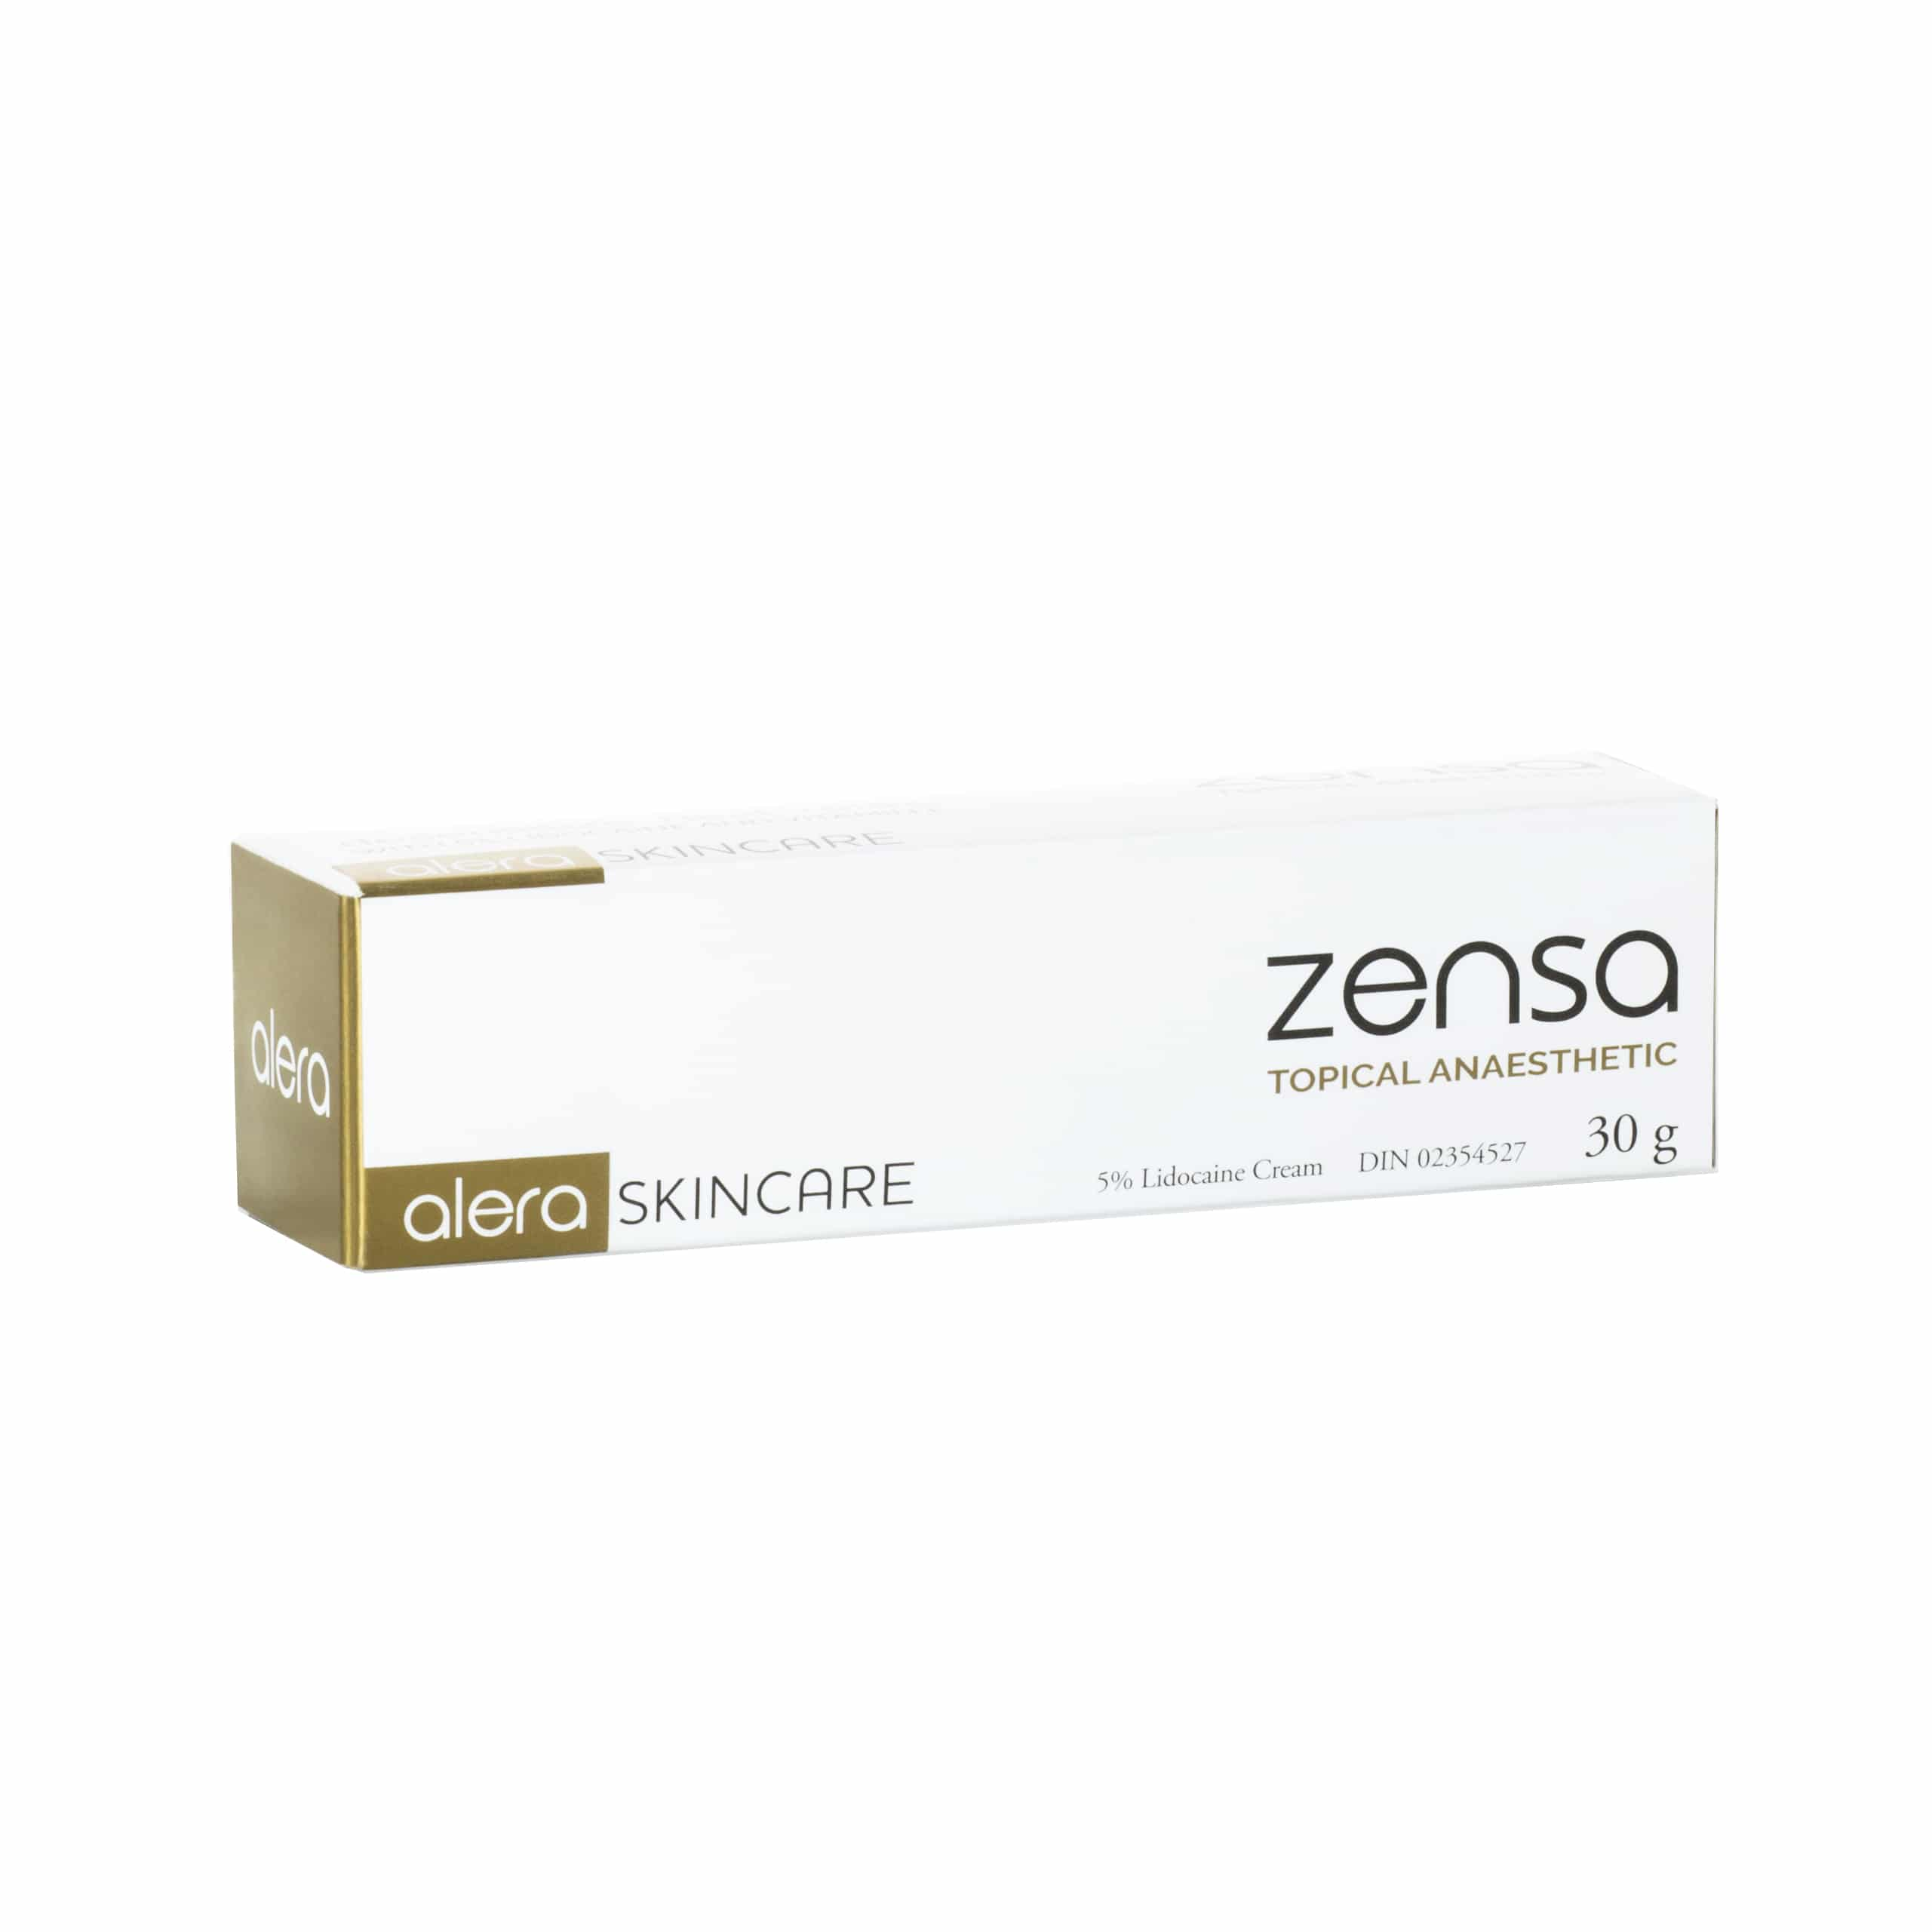 Zensa Anesthetic Cream